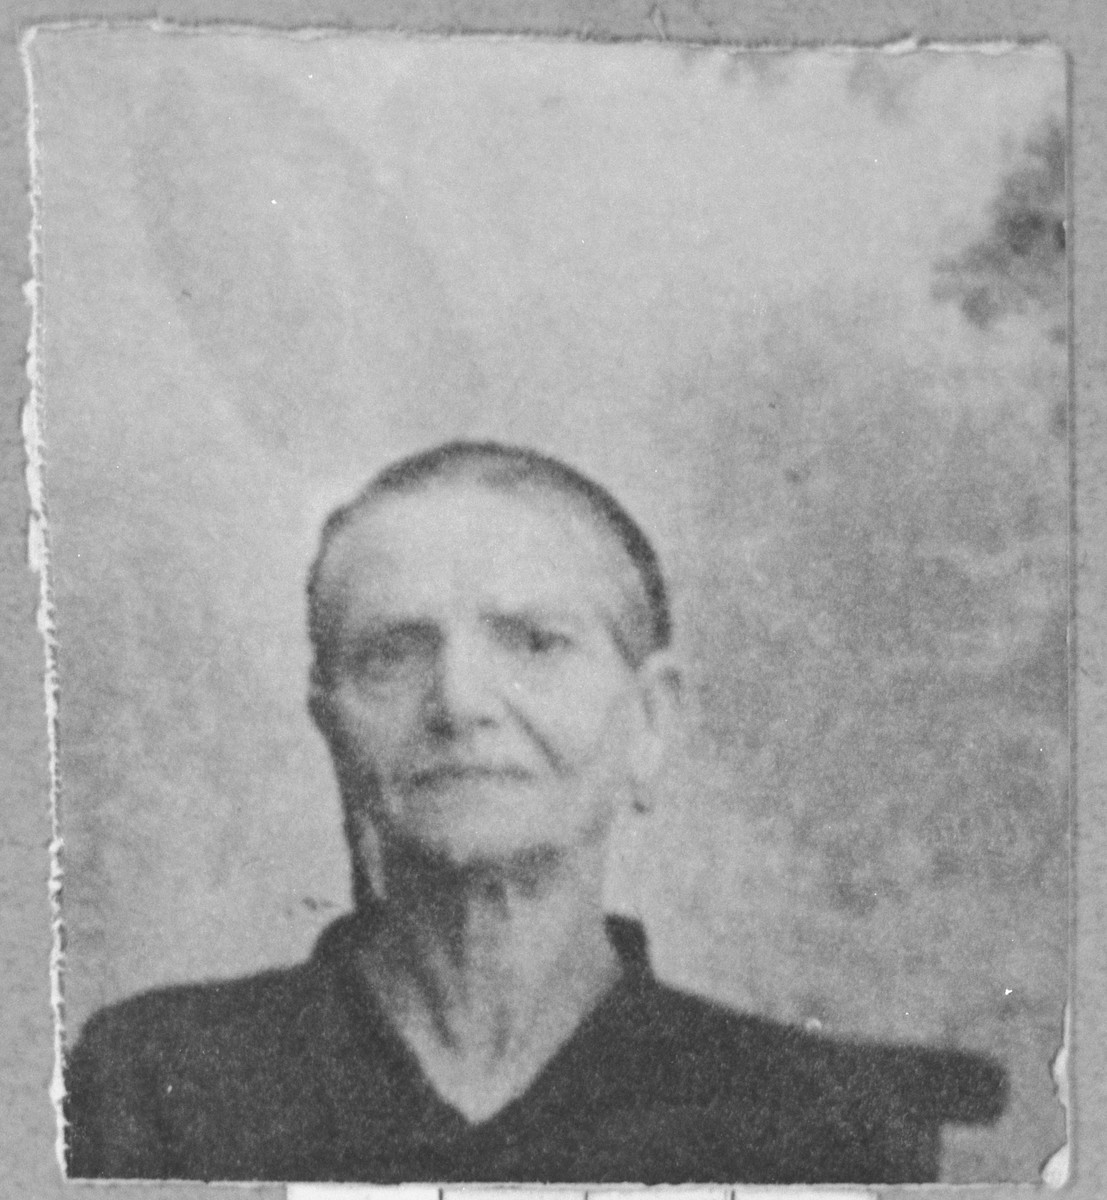 Portrait of Suncho Faradji, wife of Mushon Faradji.  She lived at Dr. Raisa 134 in Bitola.